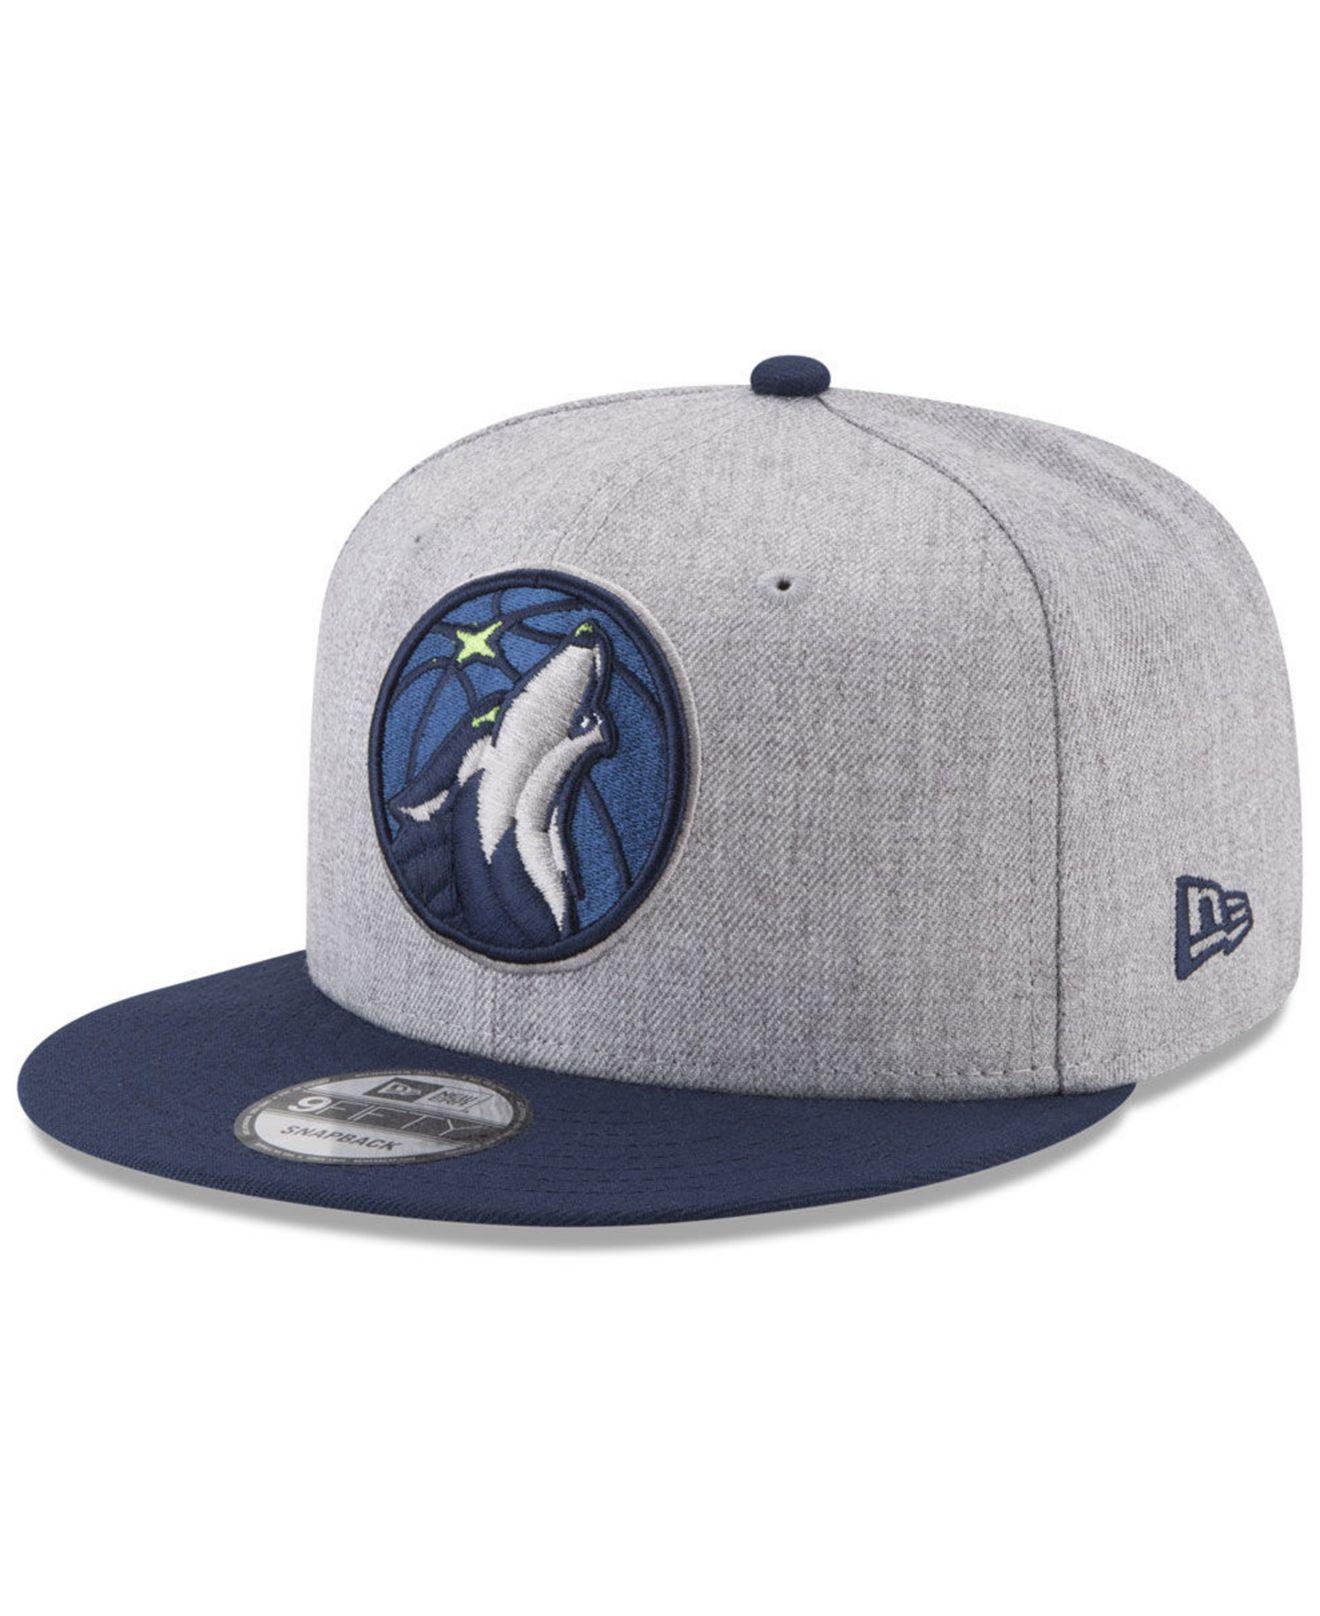 KTZ. Men s Blue Minnesota Timberwolves Heather 2tone Current 9fifty Snapback  Cap e328af4ba96f